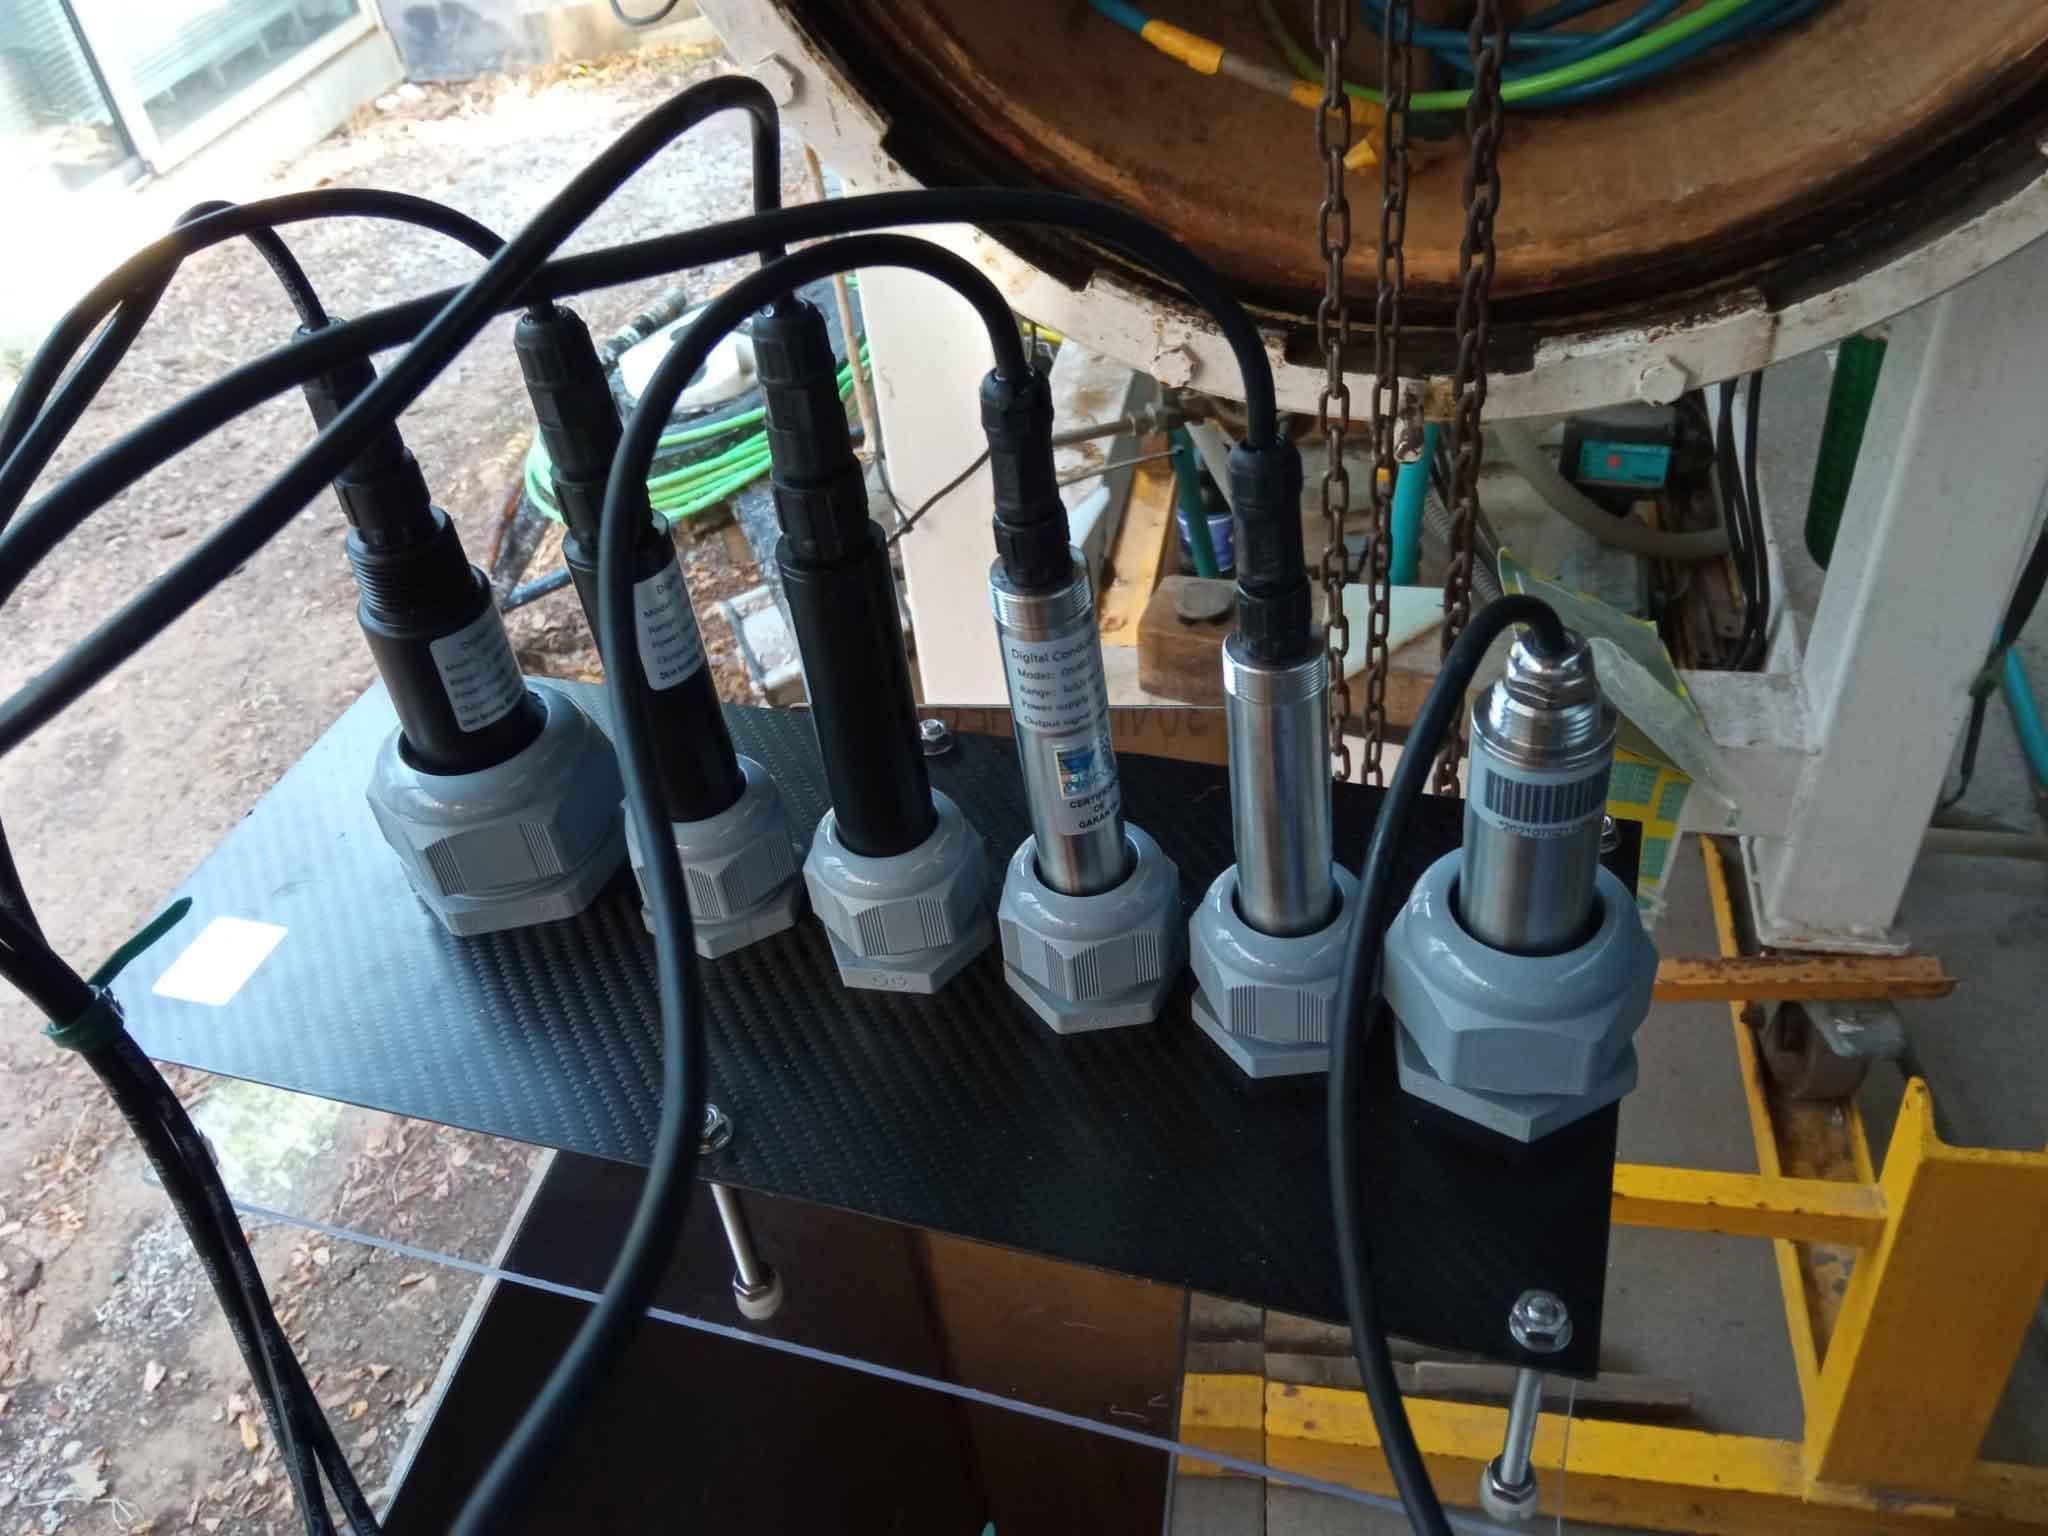 COD氨氮水中油等传感器在工业废水监测中的应用